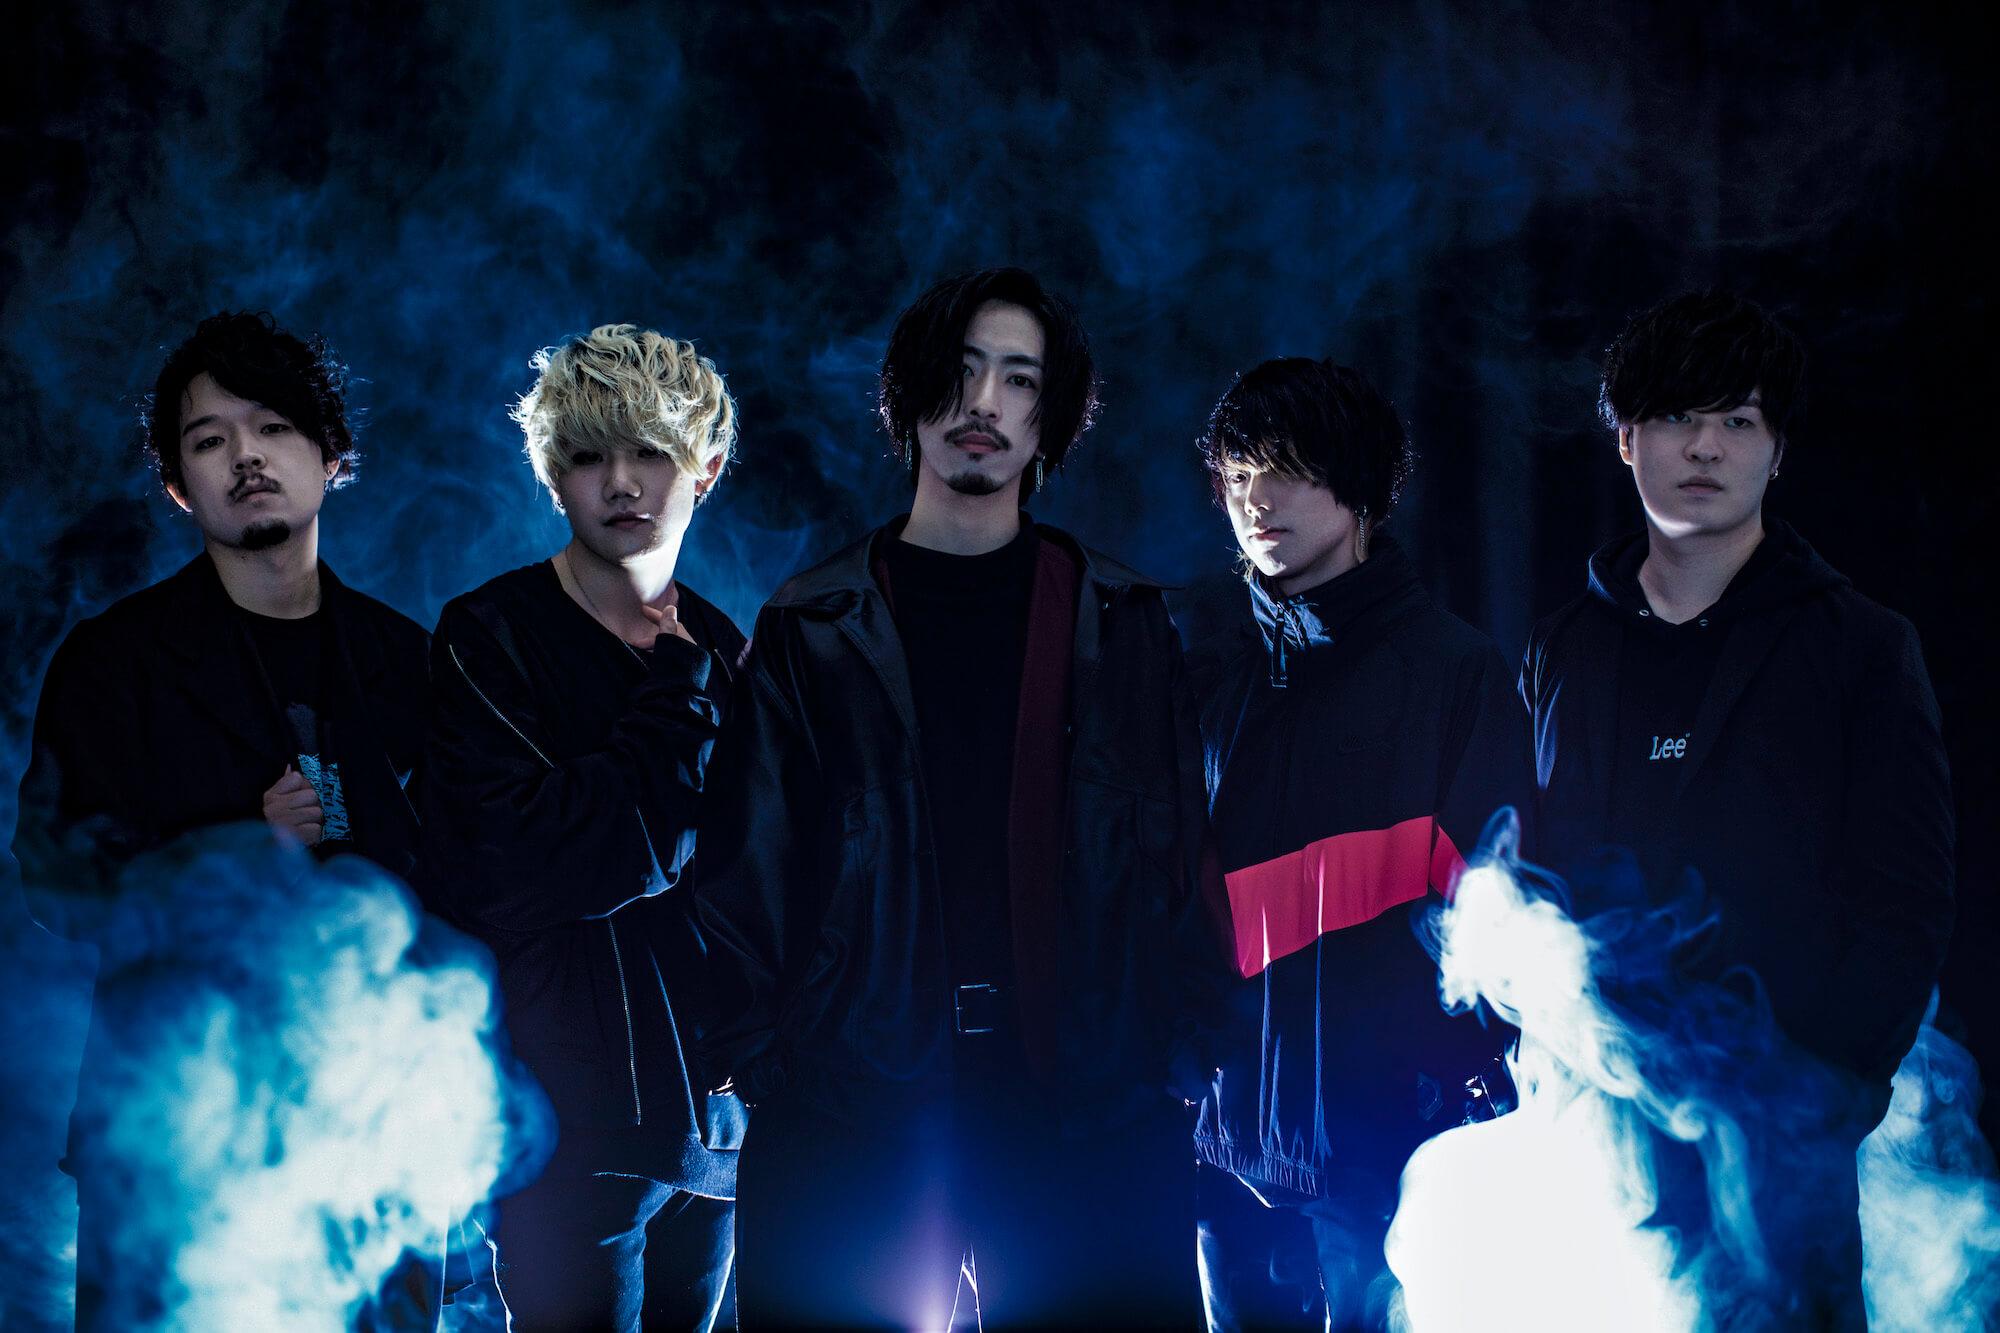 『CultureZ』内コーナー「8DAYS」 8/16(月)~に新世代バンド「シズクノメ」出演決定!